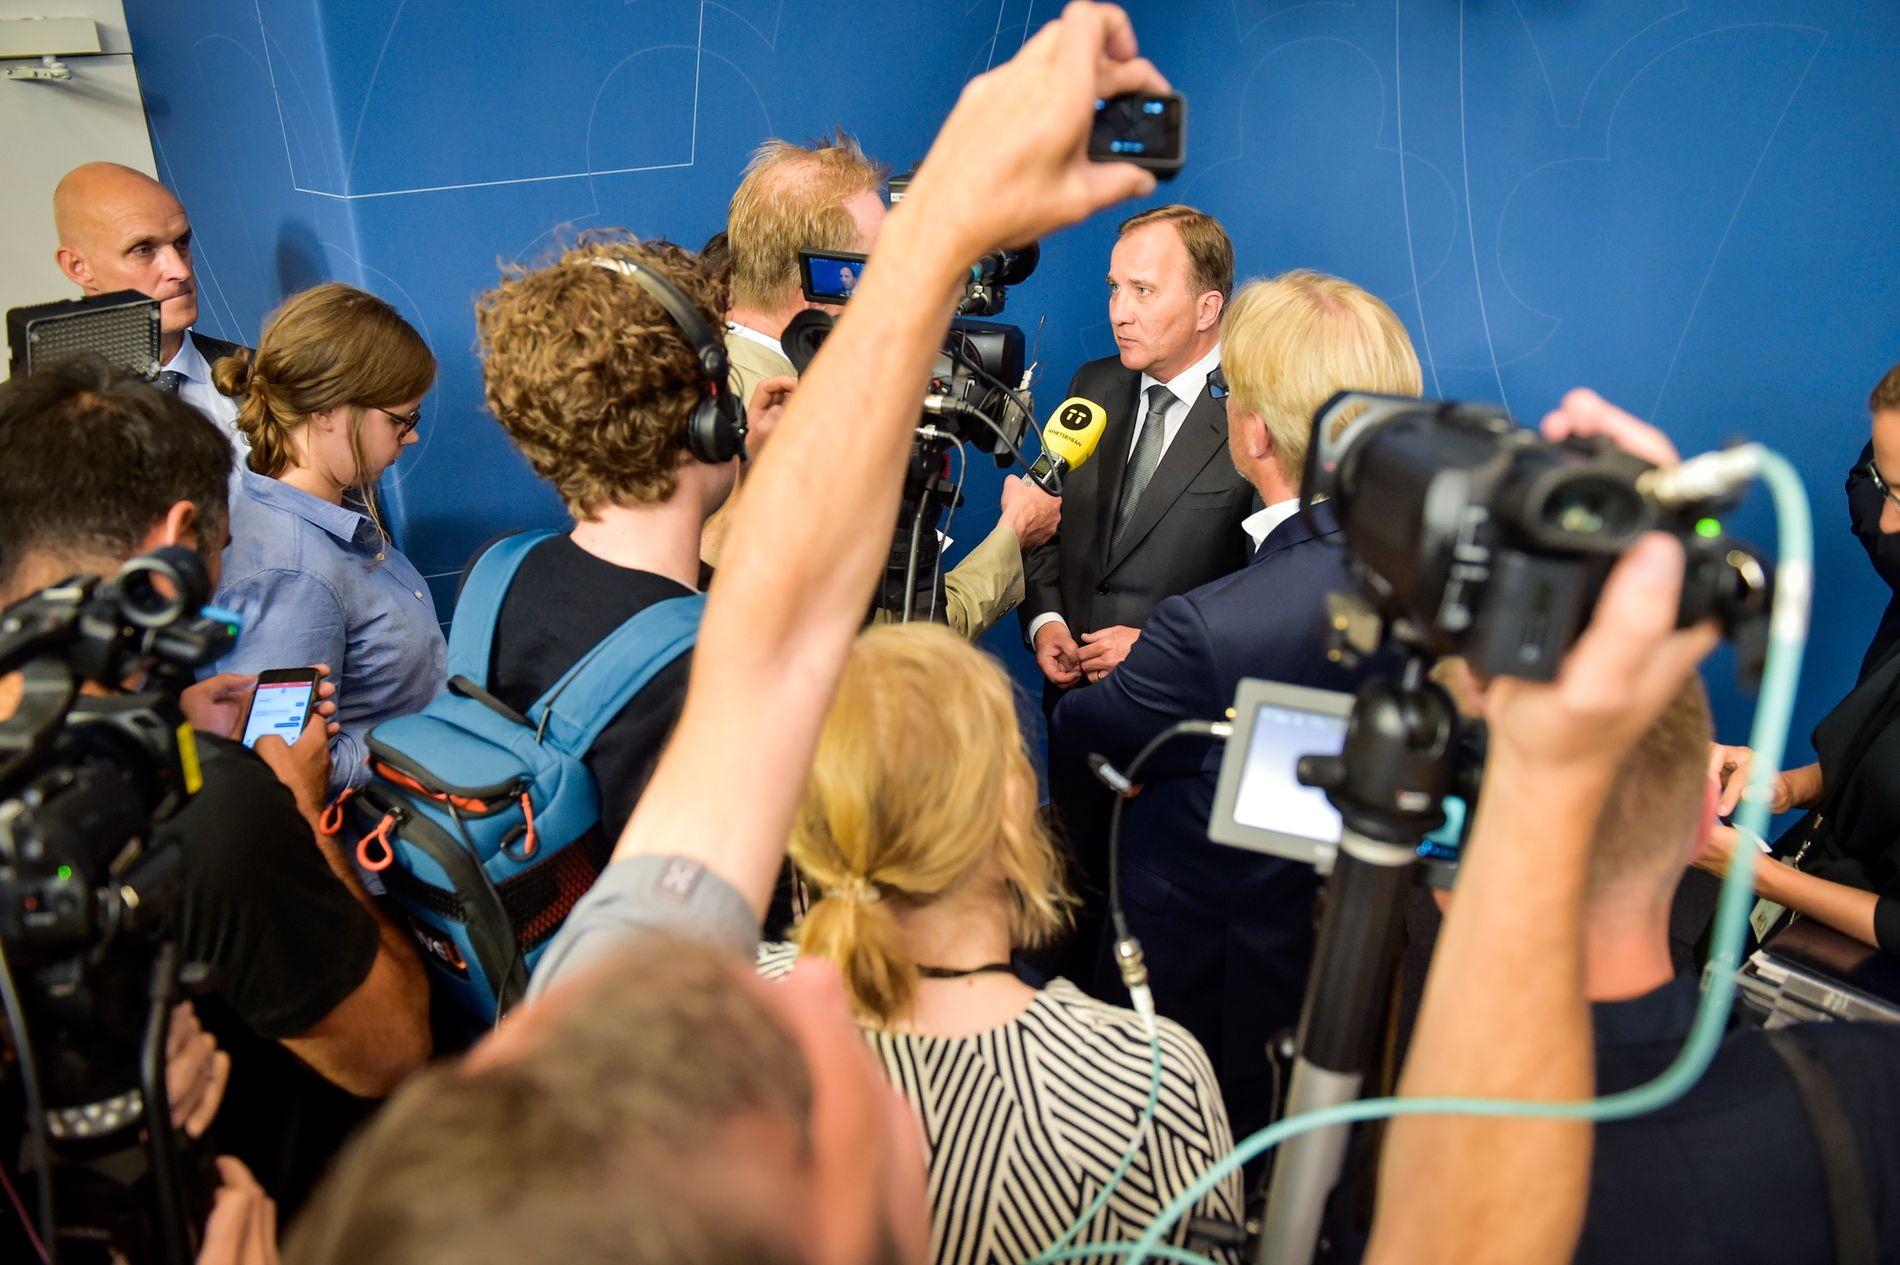 MIDT I STORMEN: Statsminister Stefan Löfven måtte svare for hvordan Sveriges sensitive personopplysninger kunne komme på avveie på mandagens pressekonferanse